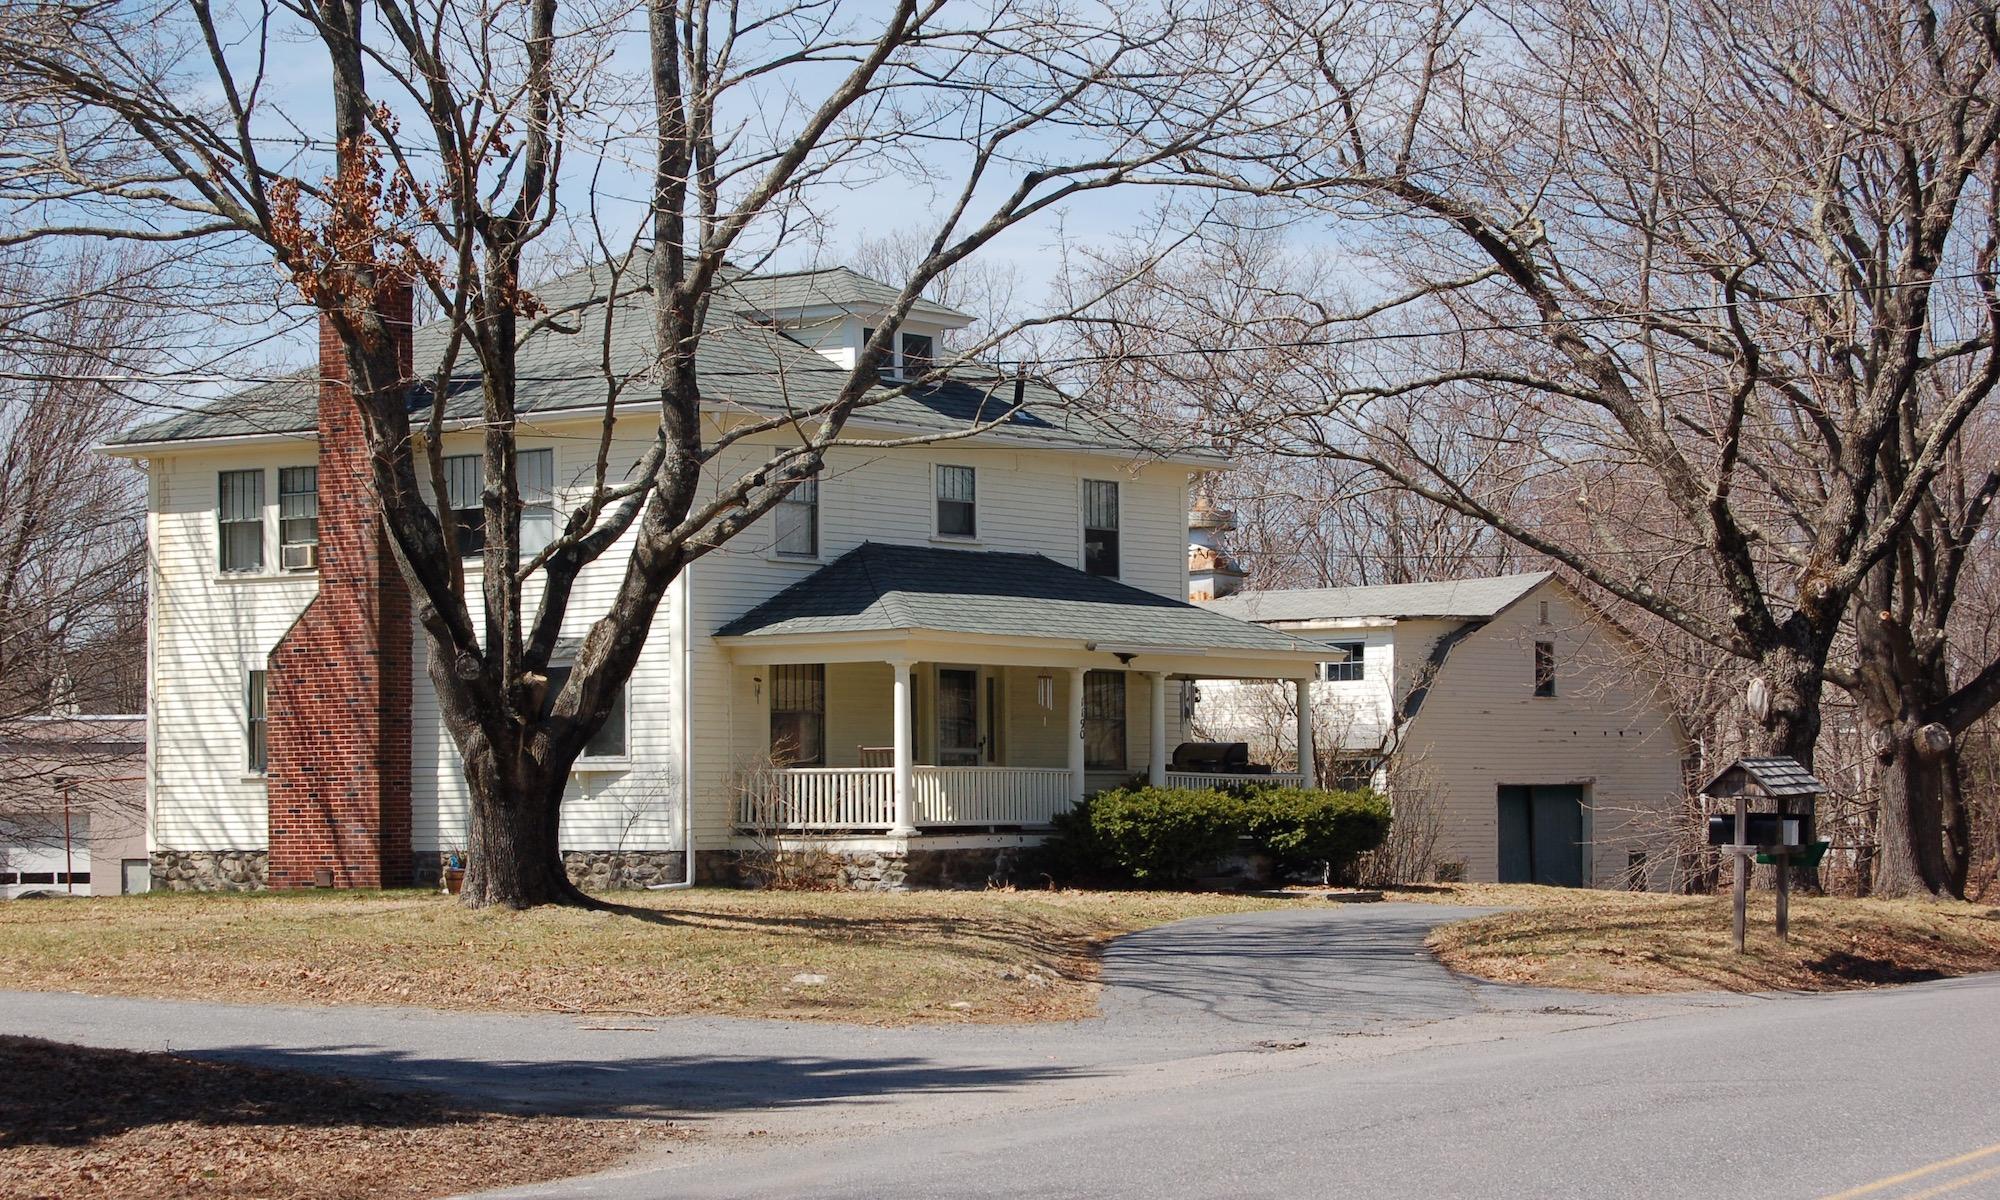 独户住宅 为 销售 在 1190 Liberty Square 1190 Liberty Square Road Boxborough, 马萨诸塞州, 01719 美国